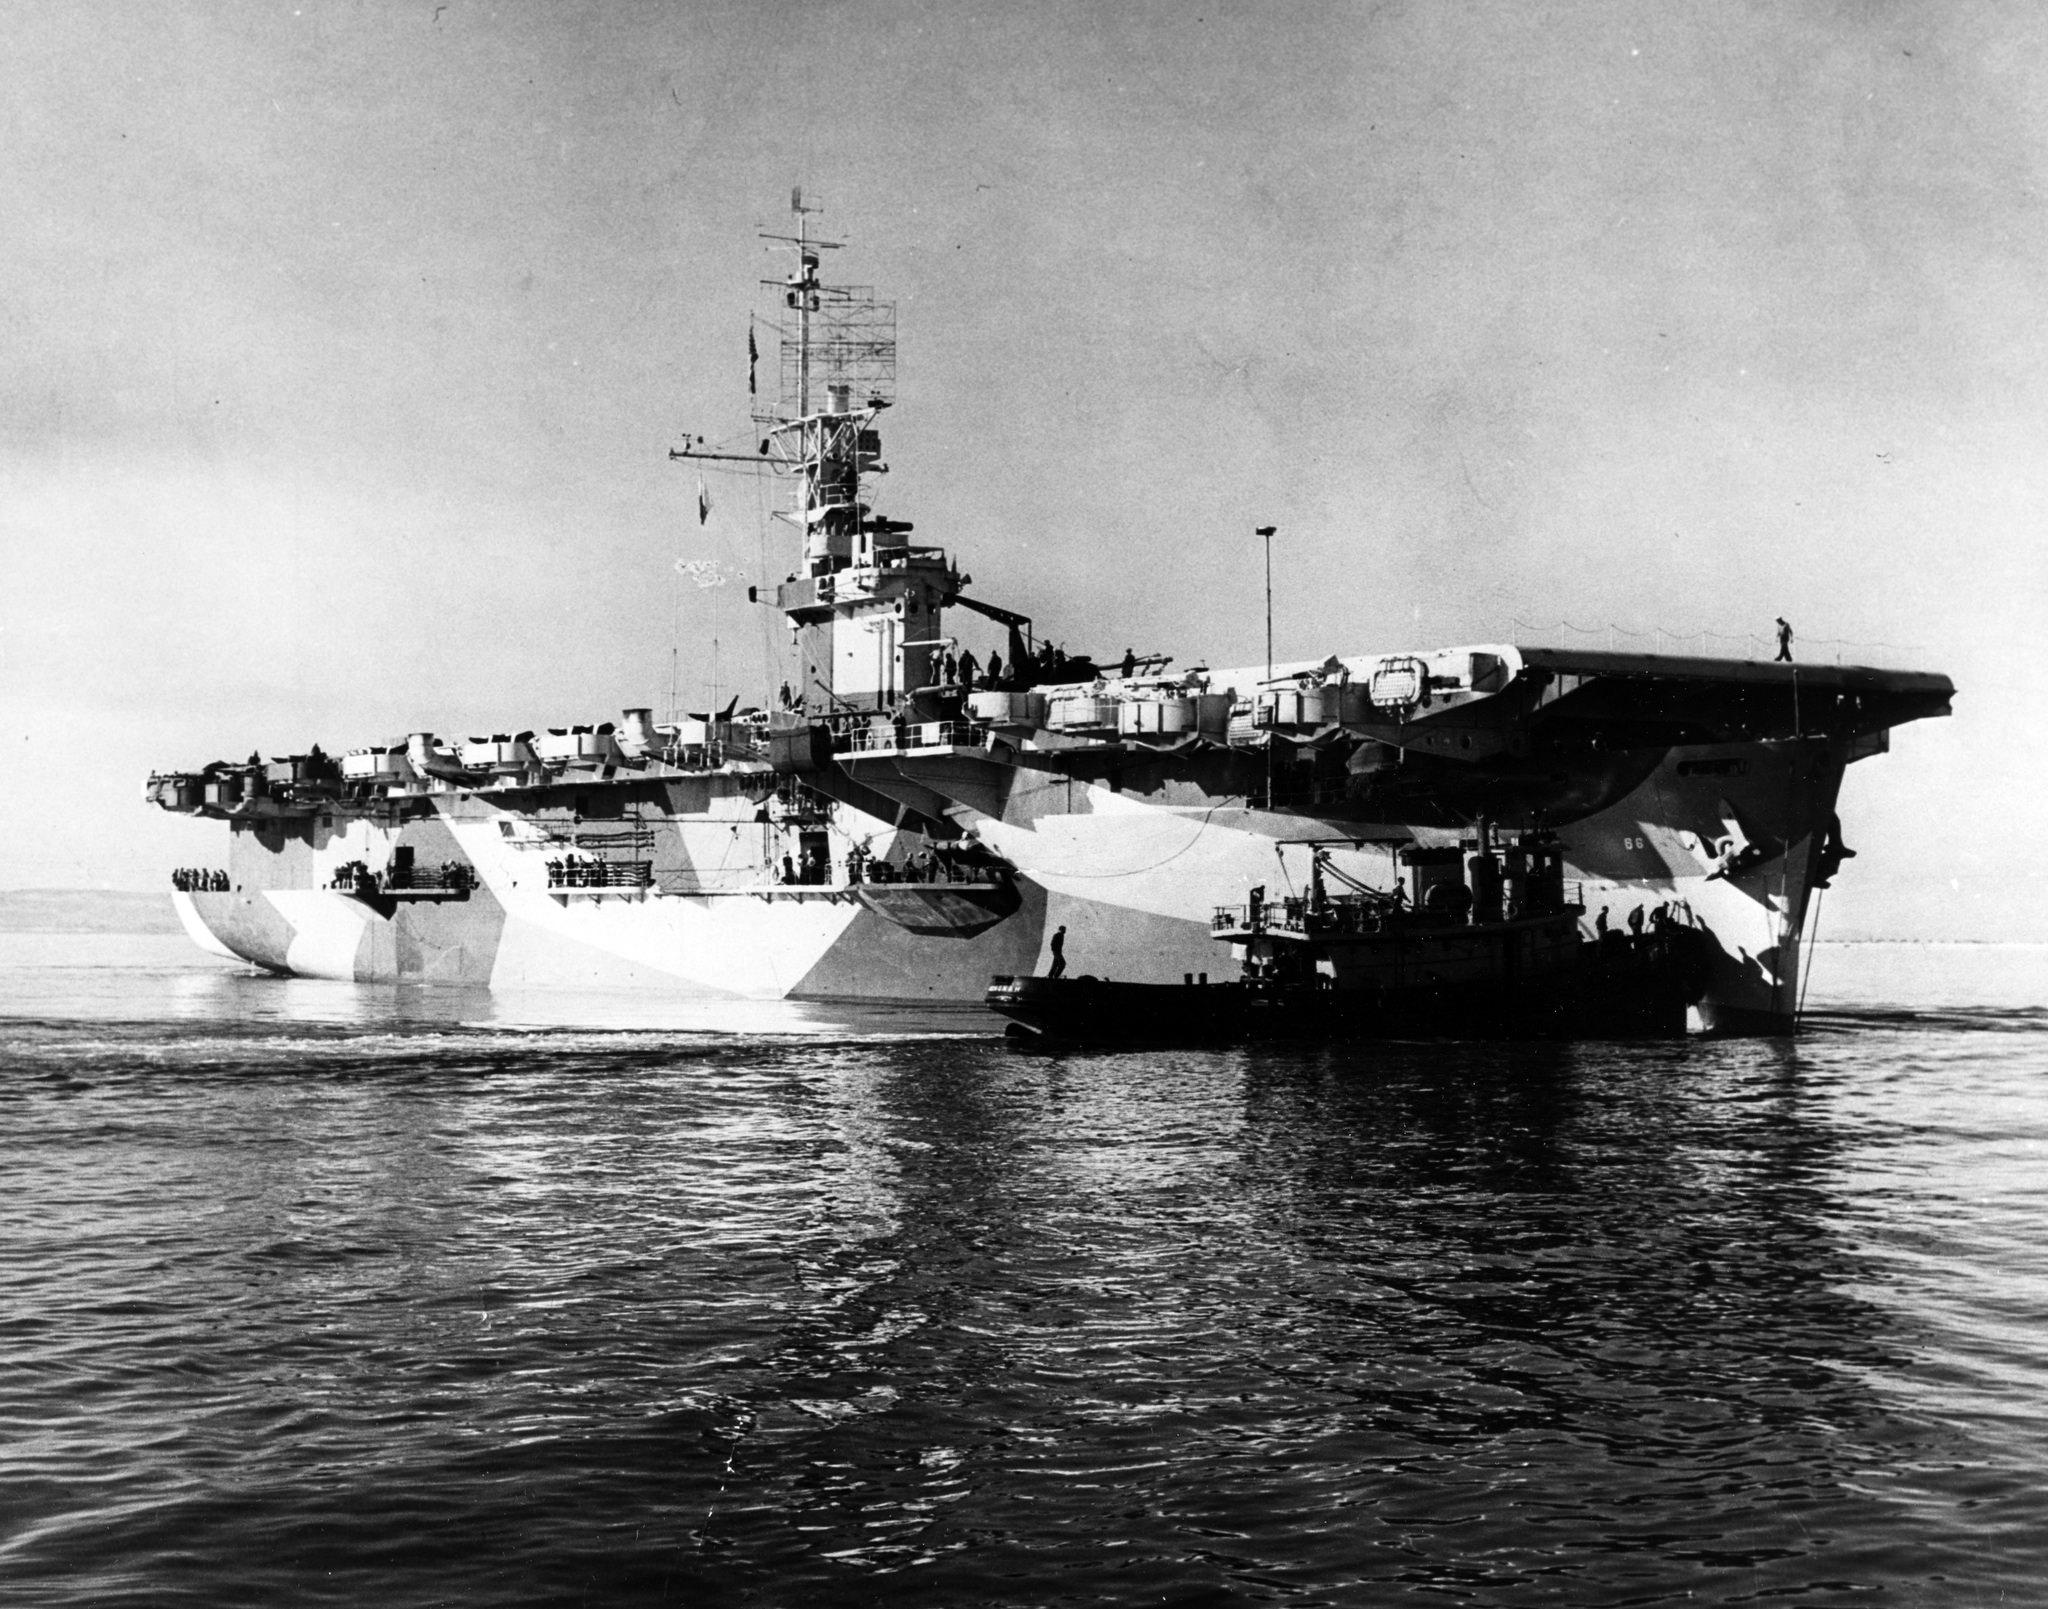 USS White Plains (CVE-66) - image courtesy of NavSource